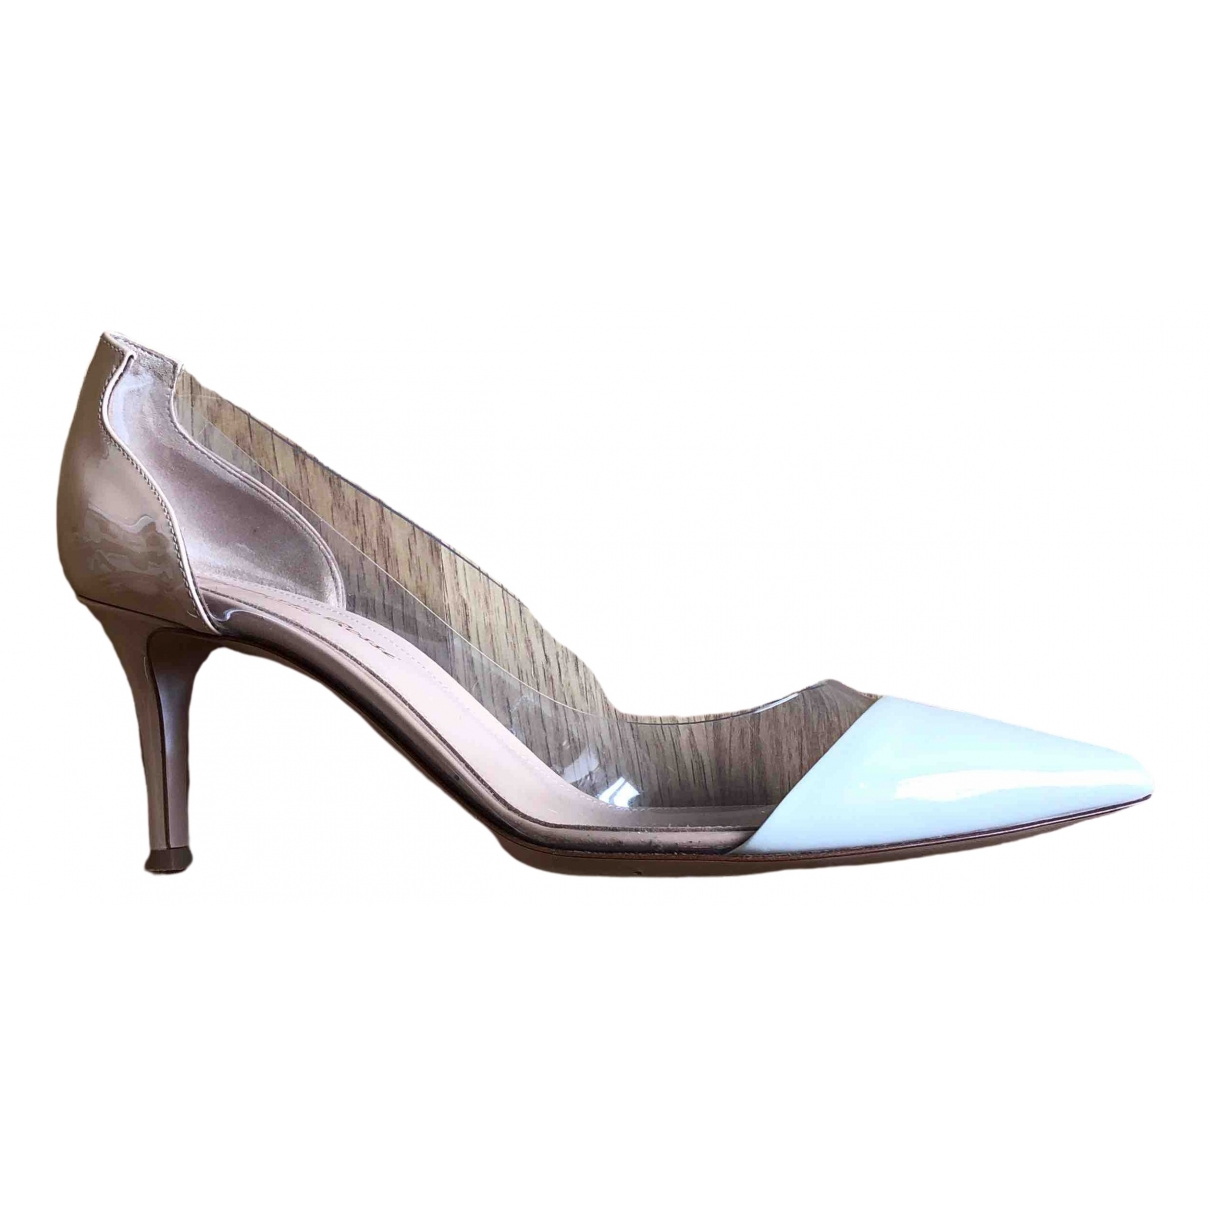 Gianvito Rossi Plexi White Patent leather Heels for Women